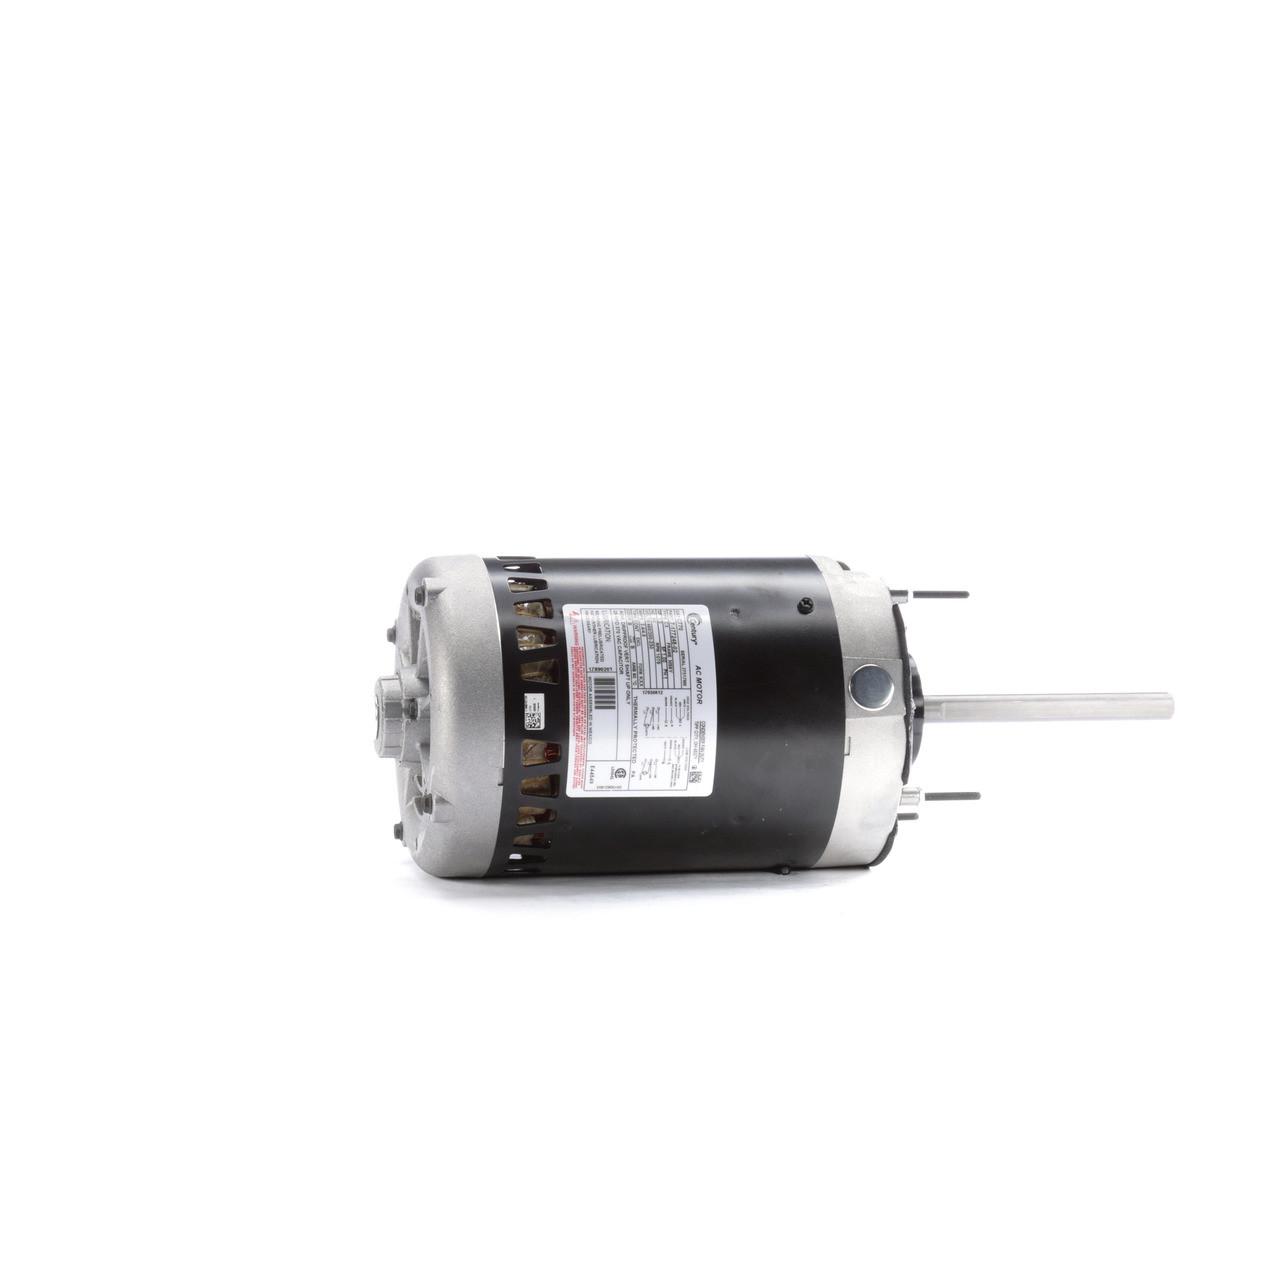 Century C770 | Condenser Fan Motor | Shop Dreisilker